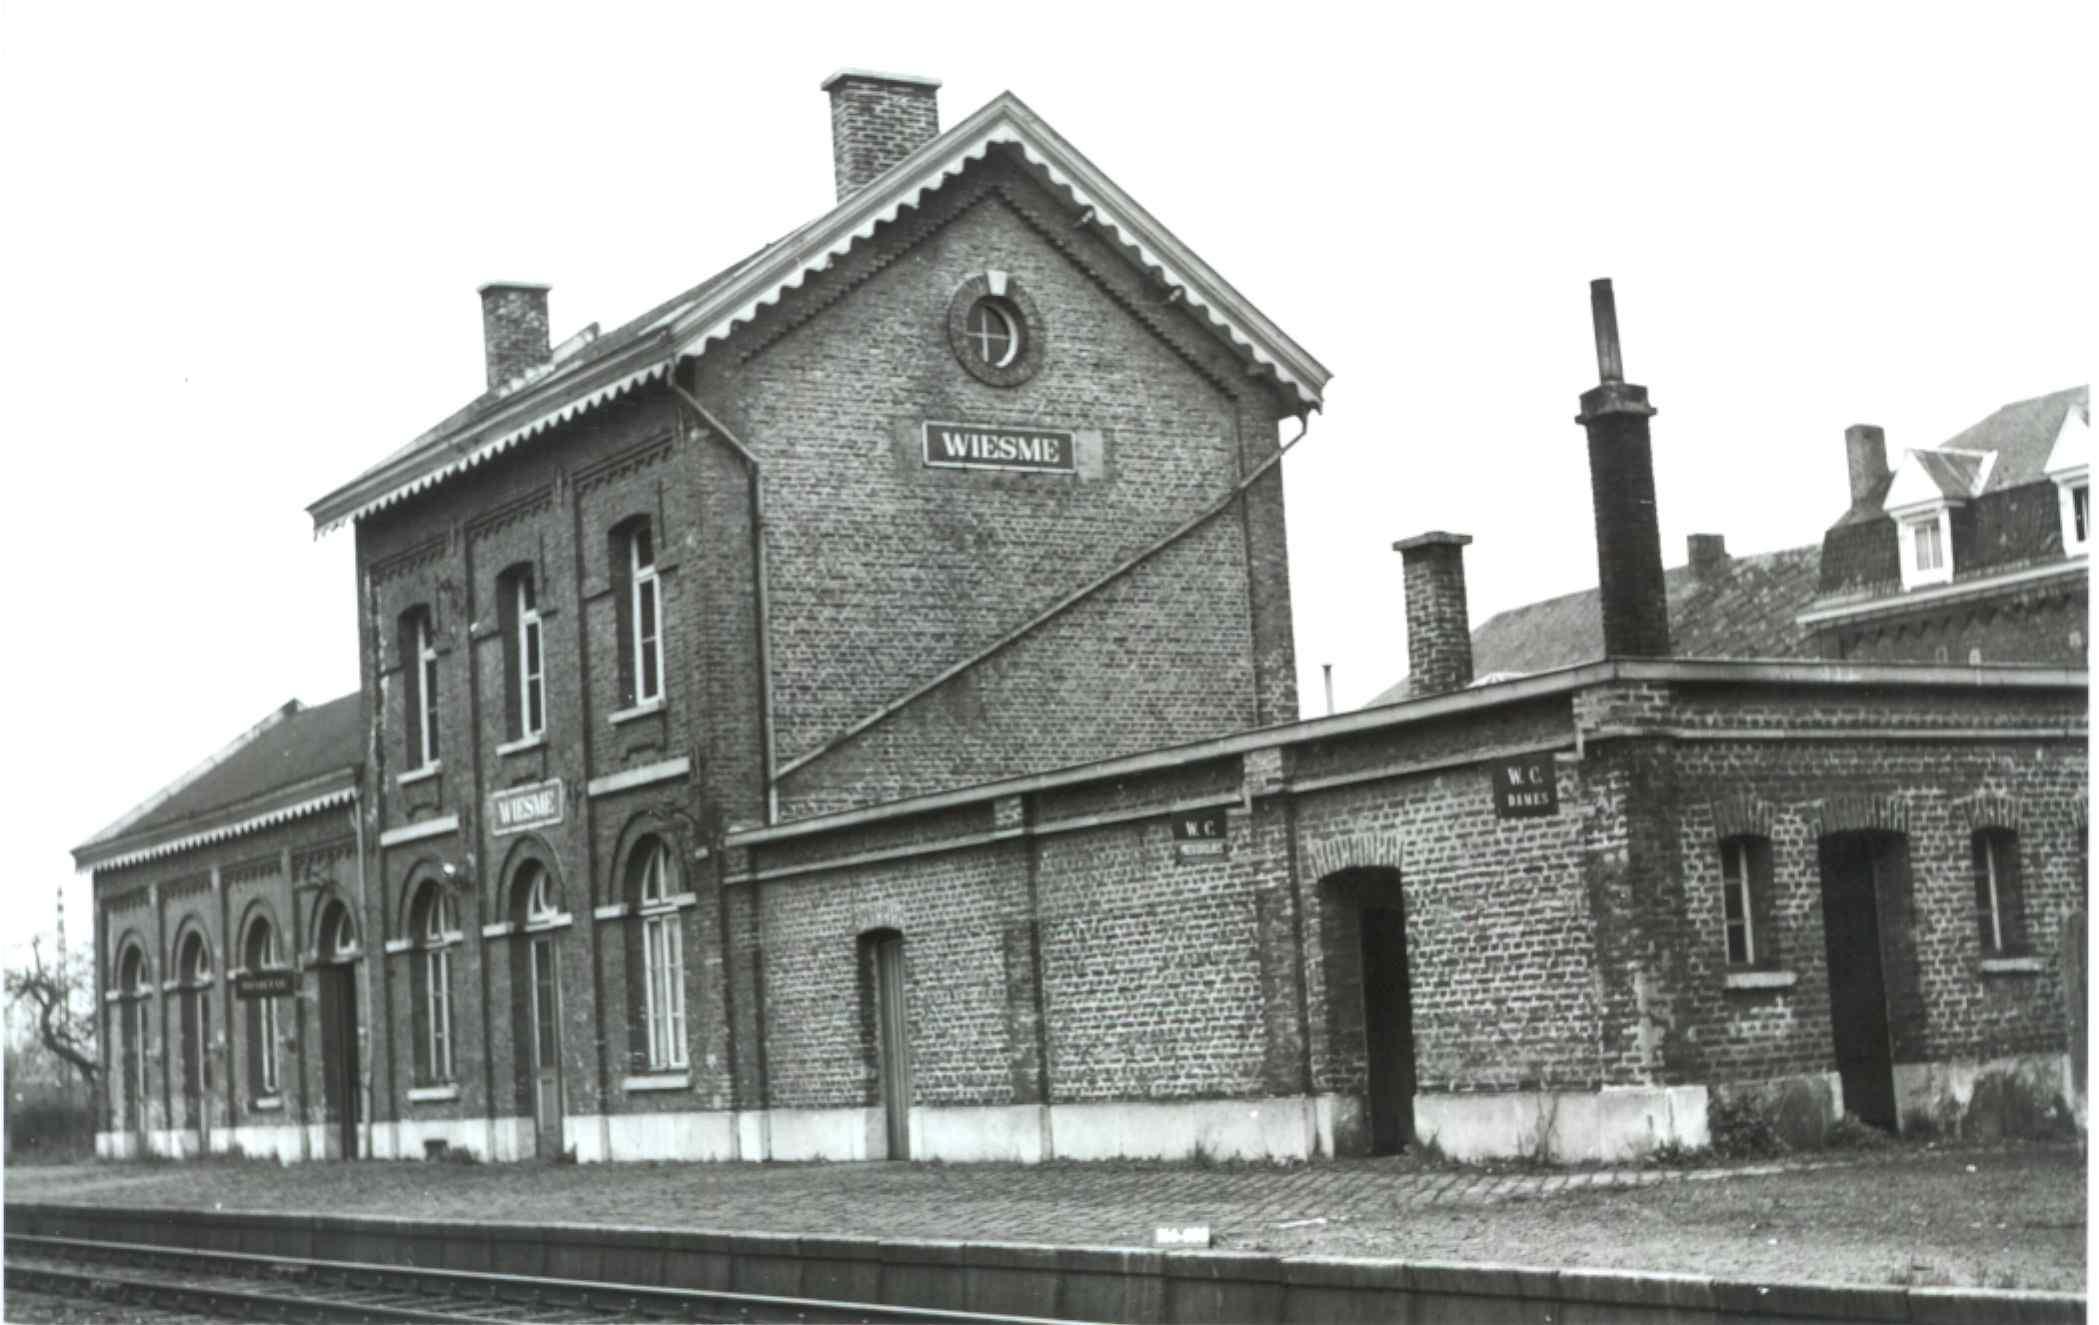 Les gares belges d 39 autrefois la gare de wiesme guy for Garage de la gare bretigny